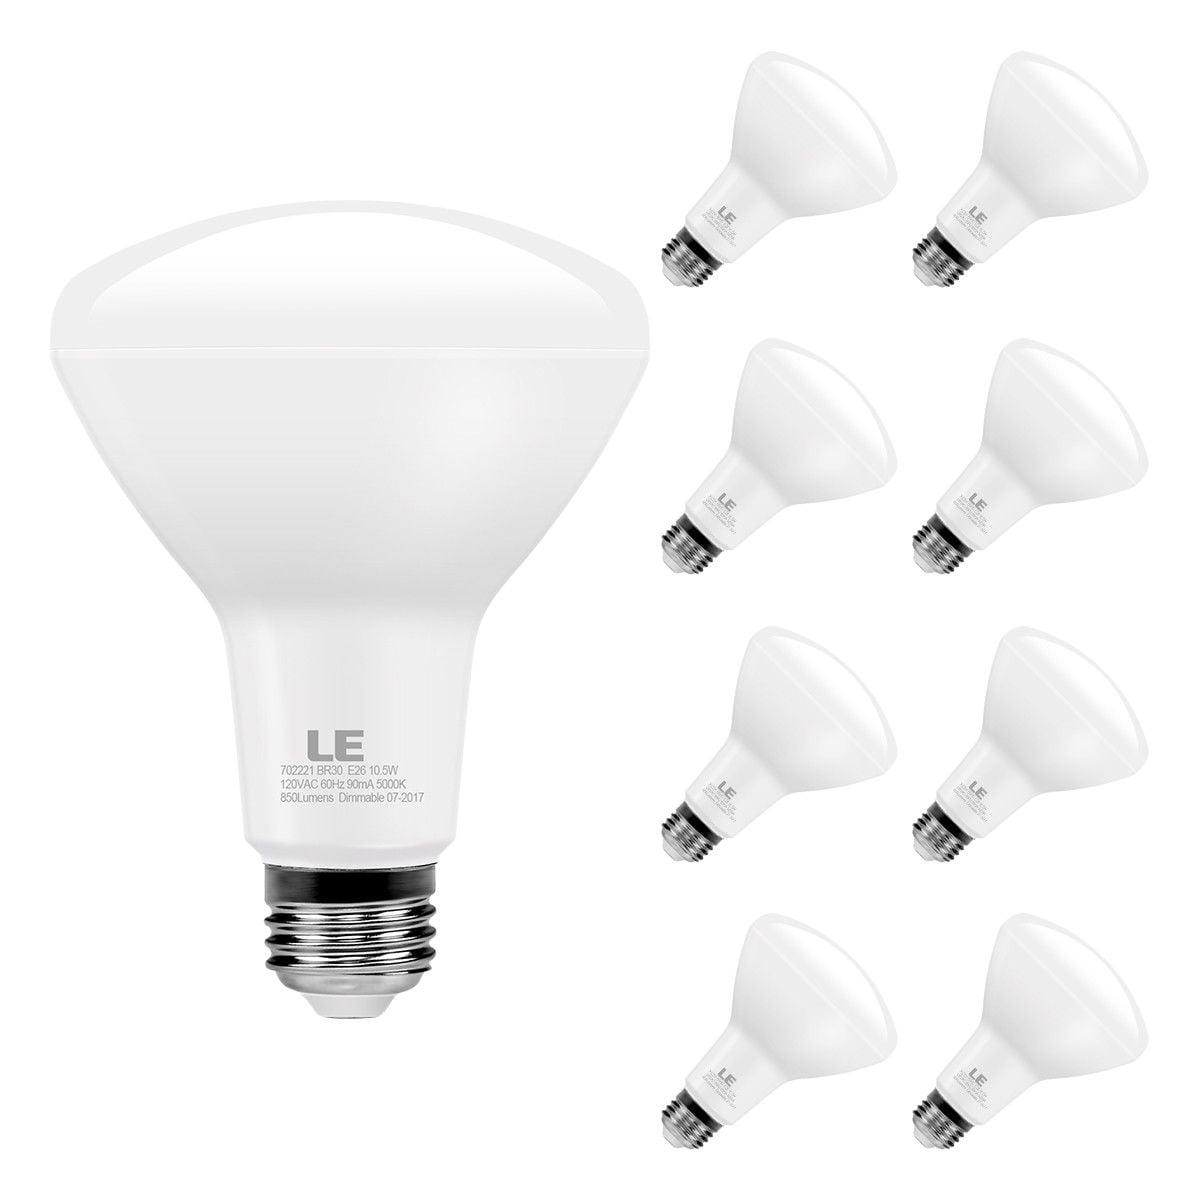 Lighting EVER 8 Pack LED Light Bulbs Dimmable 65W Equiv